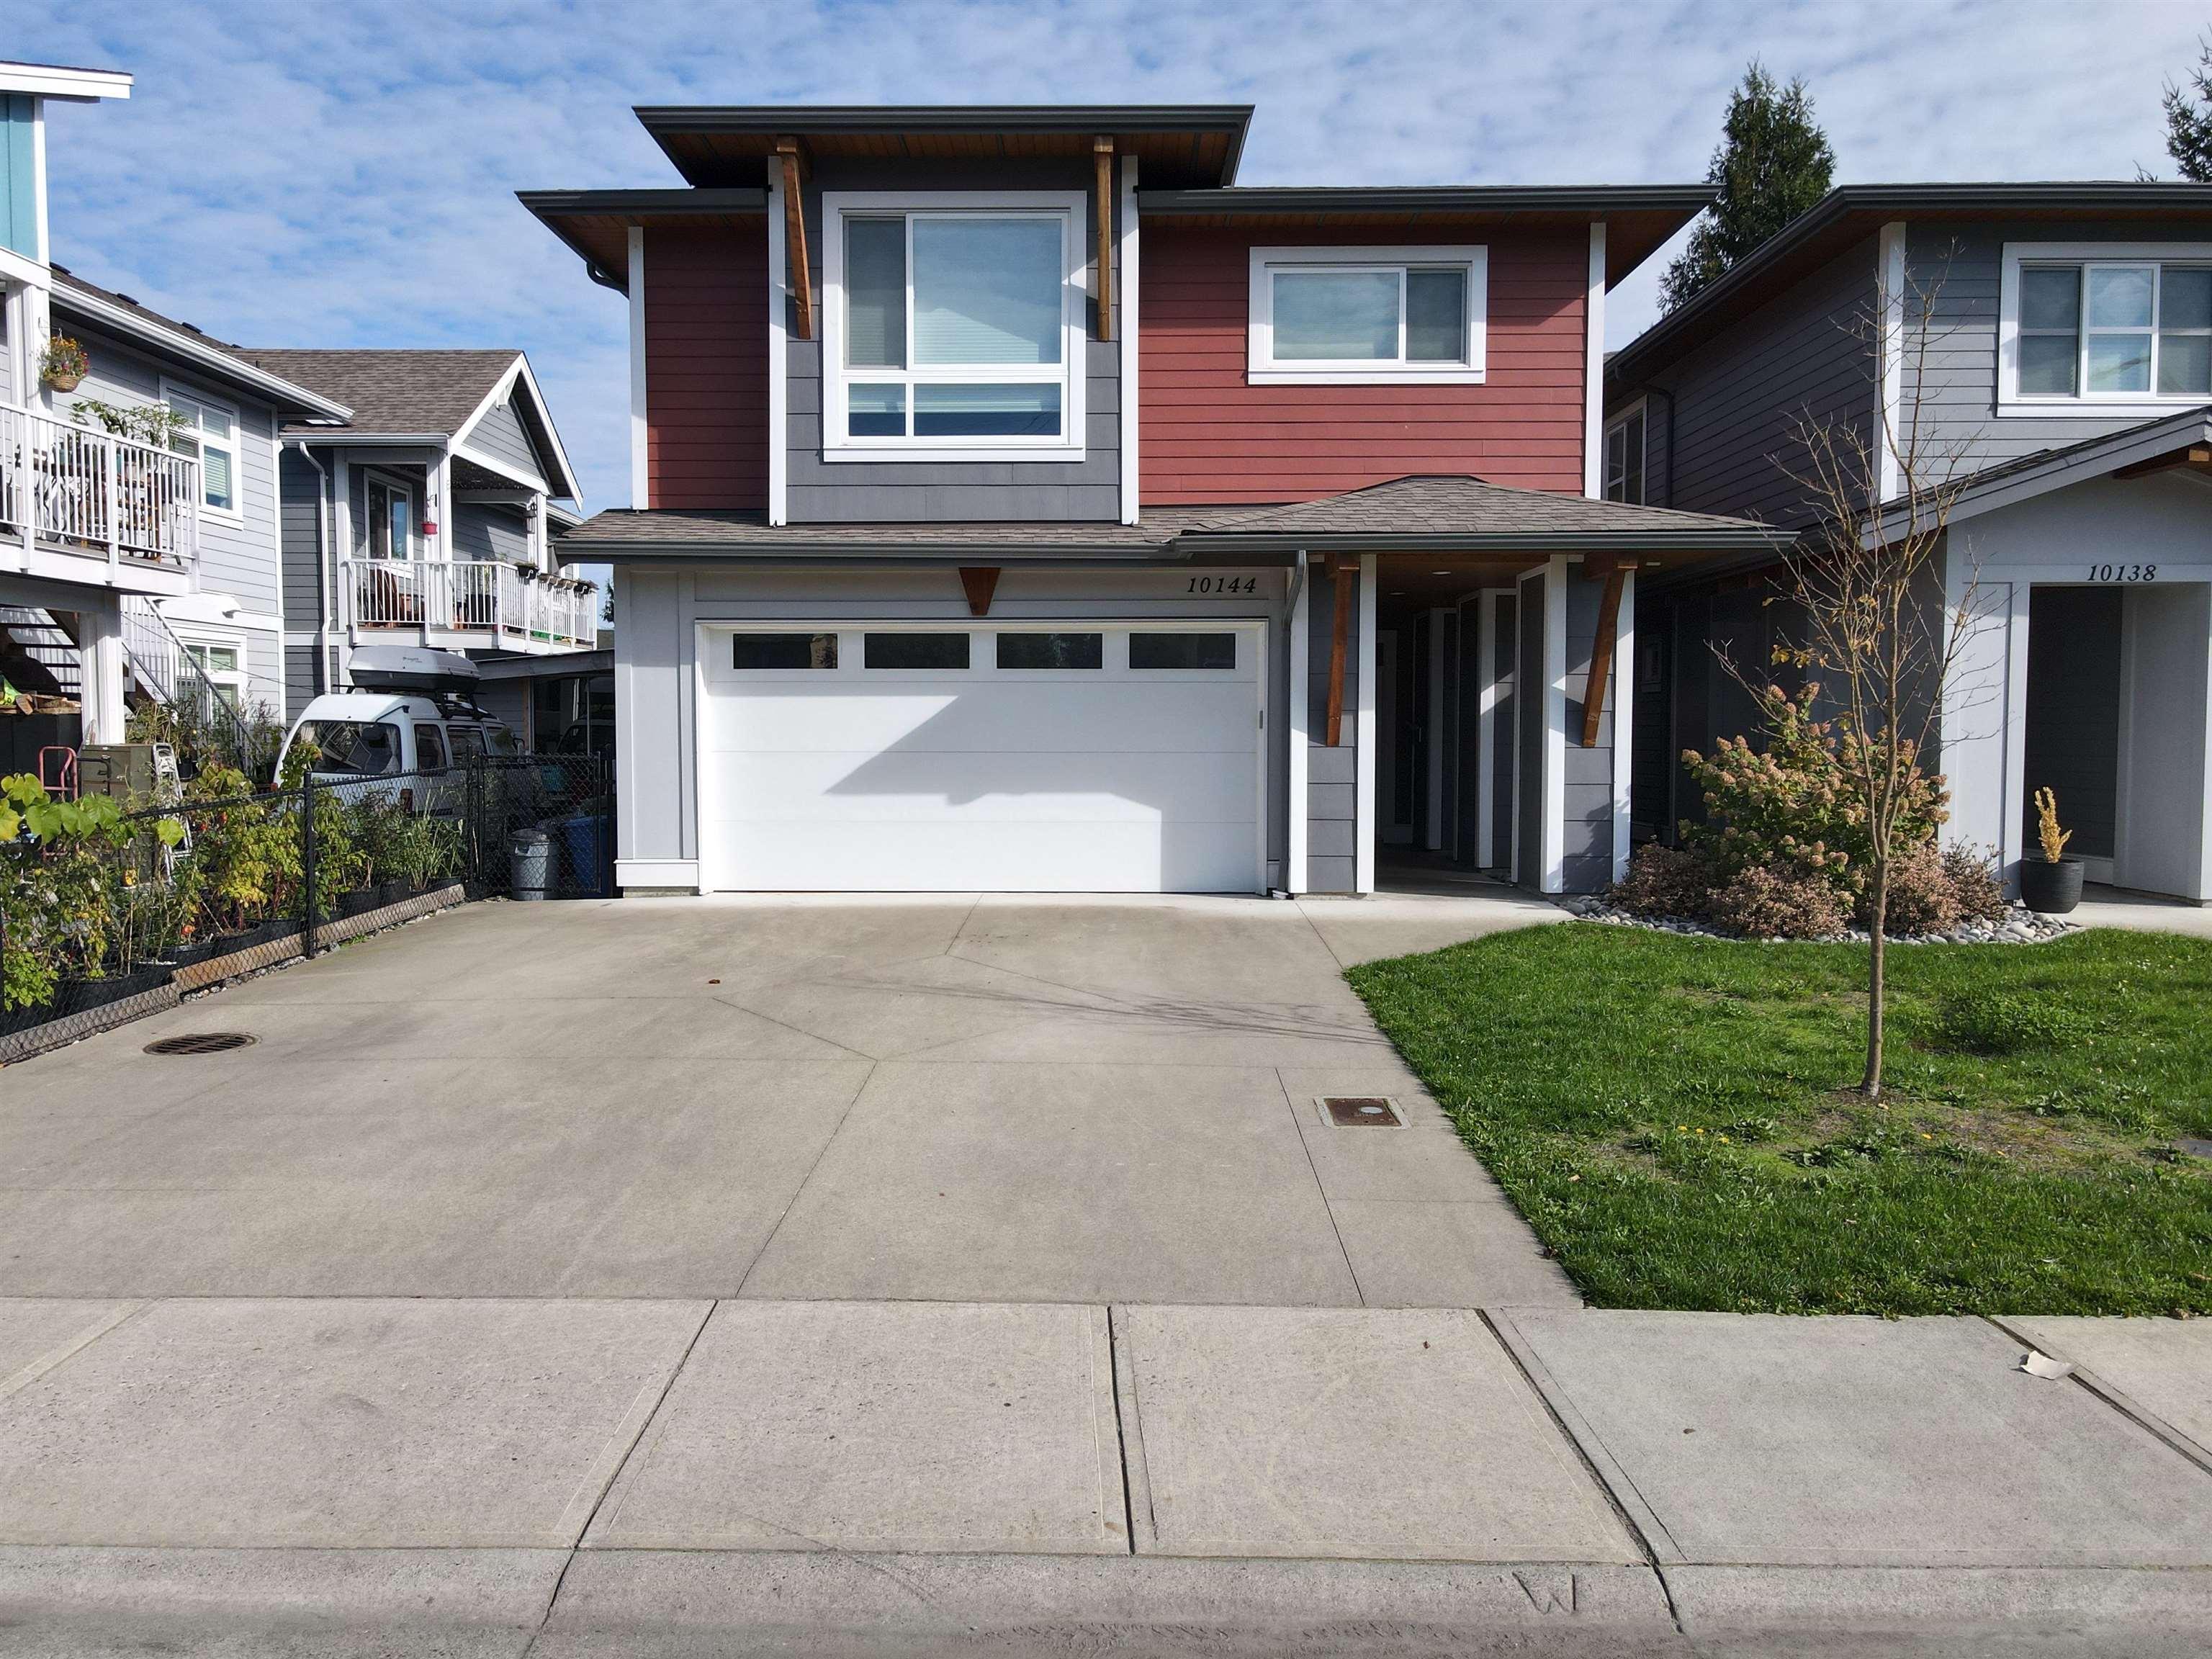 10144 KILLARNEY DRIVE - Fairfield Island House/Single Family for sale, 5 Bedrooms (R2625716) - #2